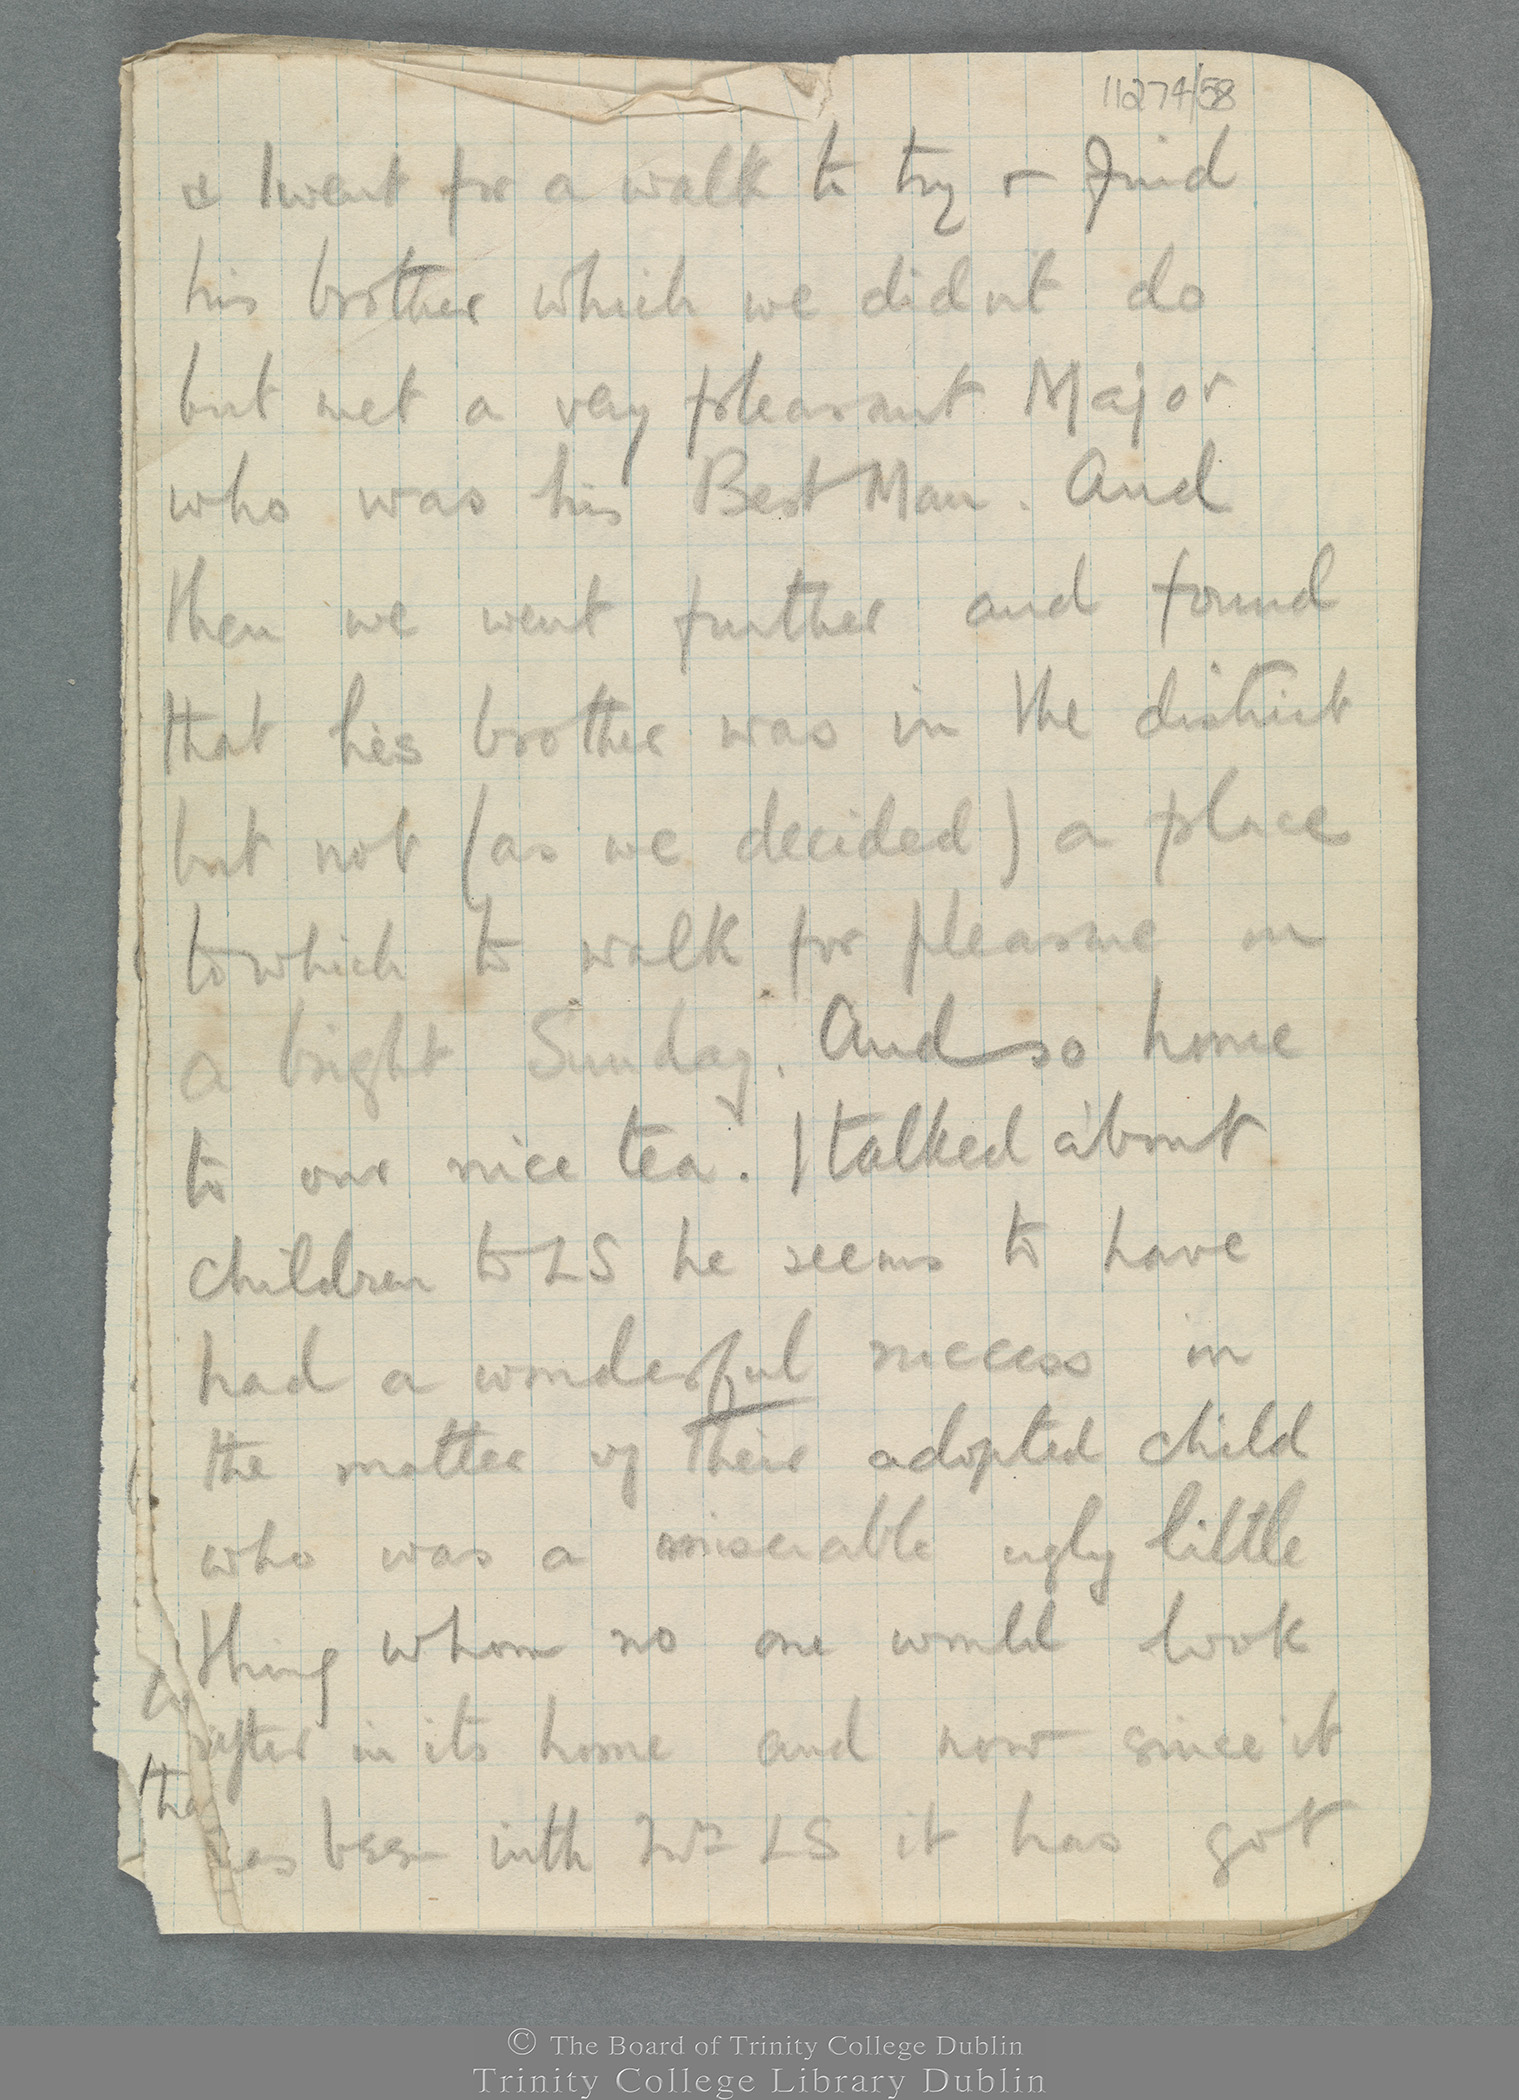 TCD MS 11274/58 folio 2 recto